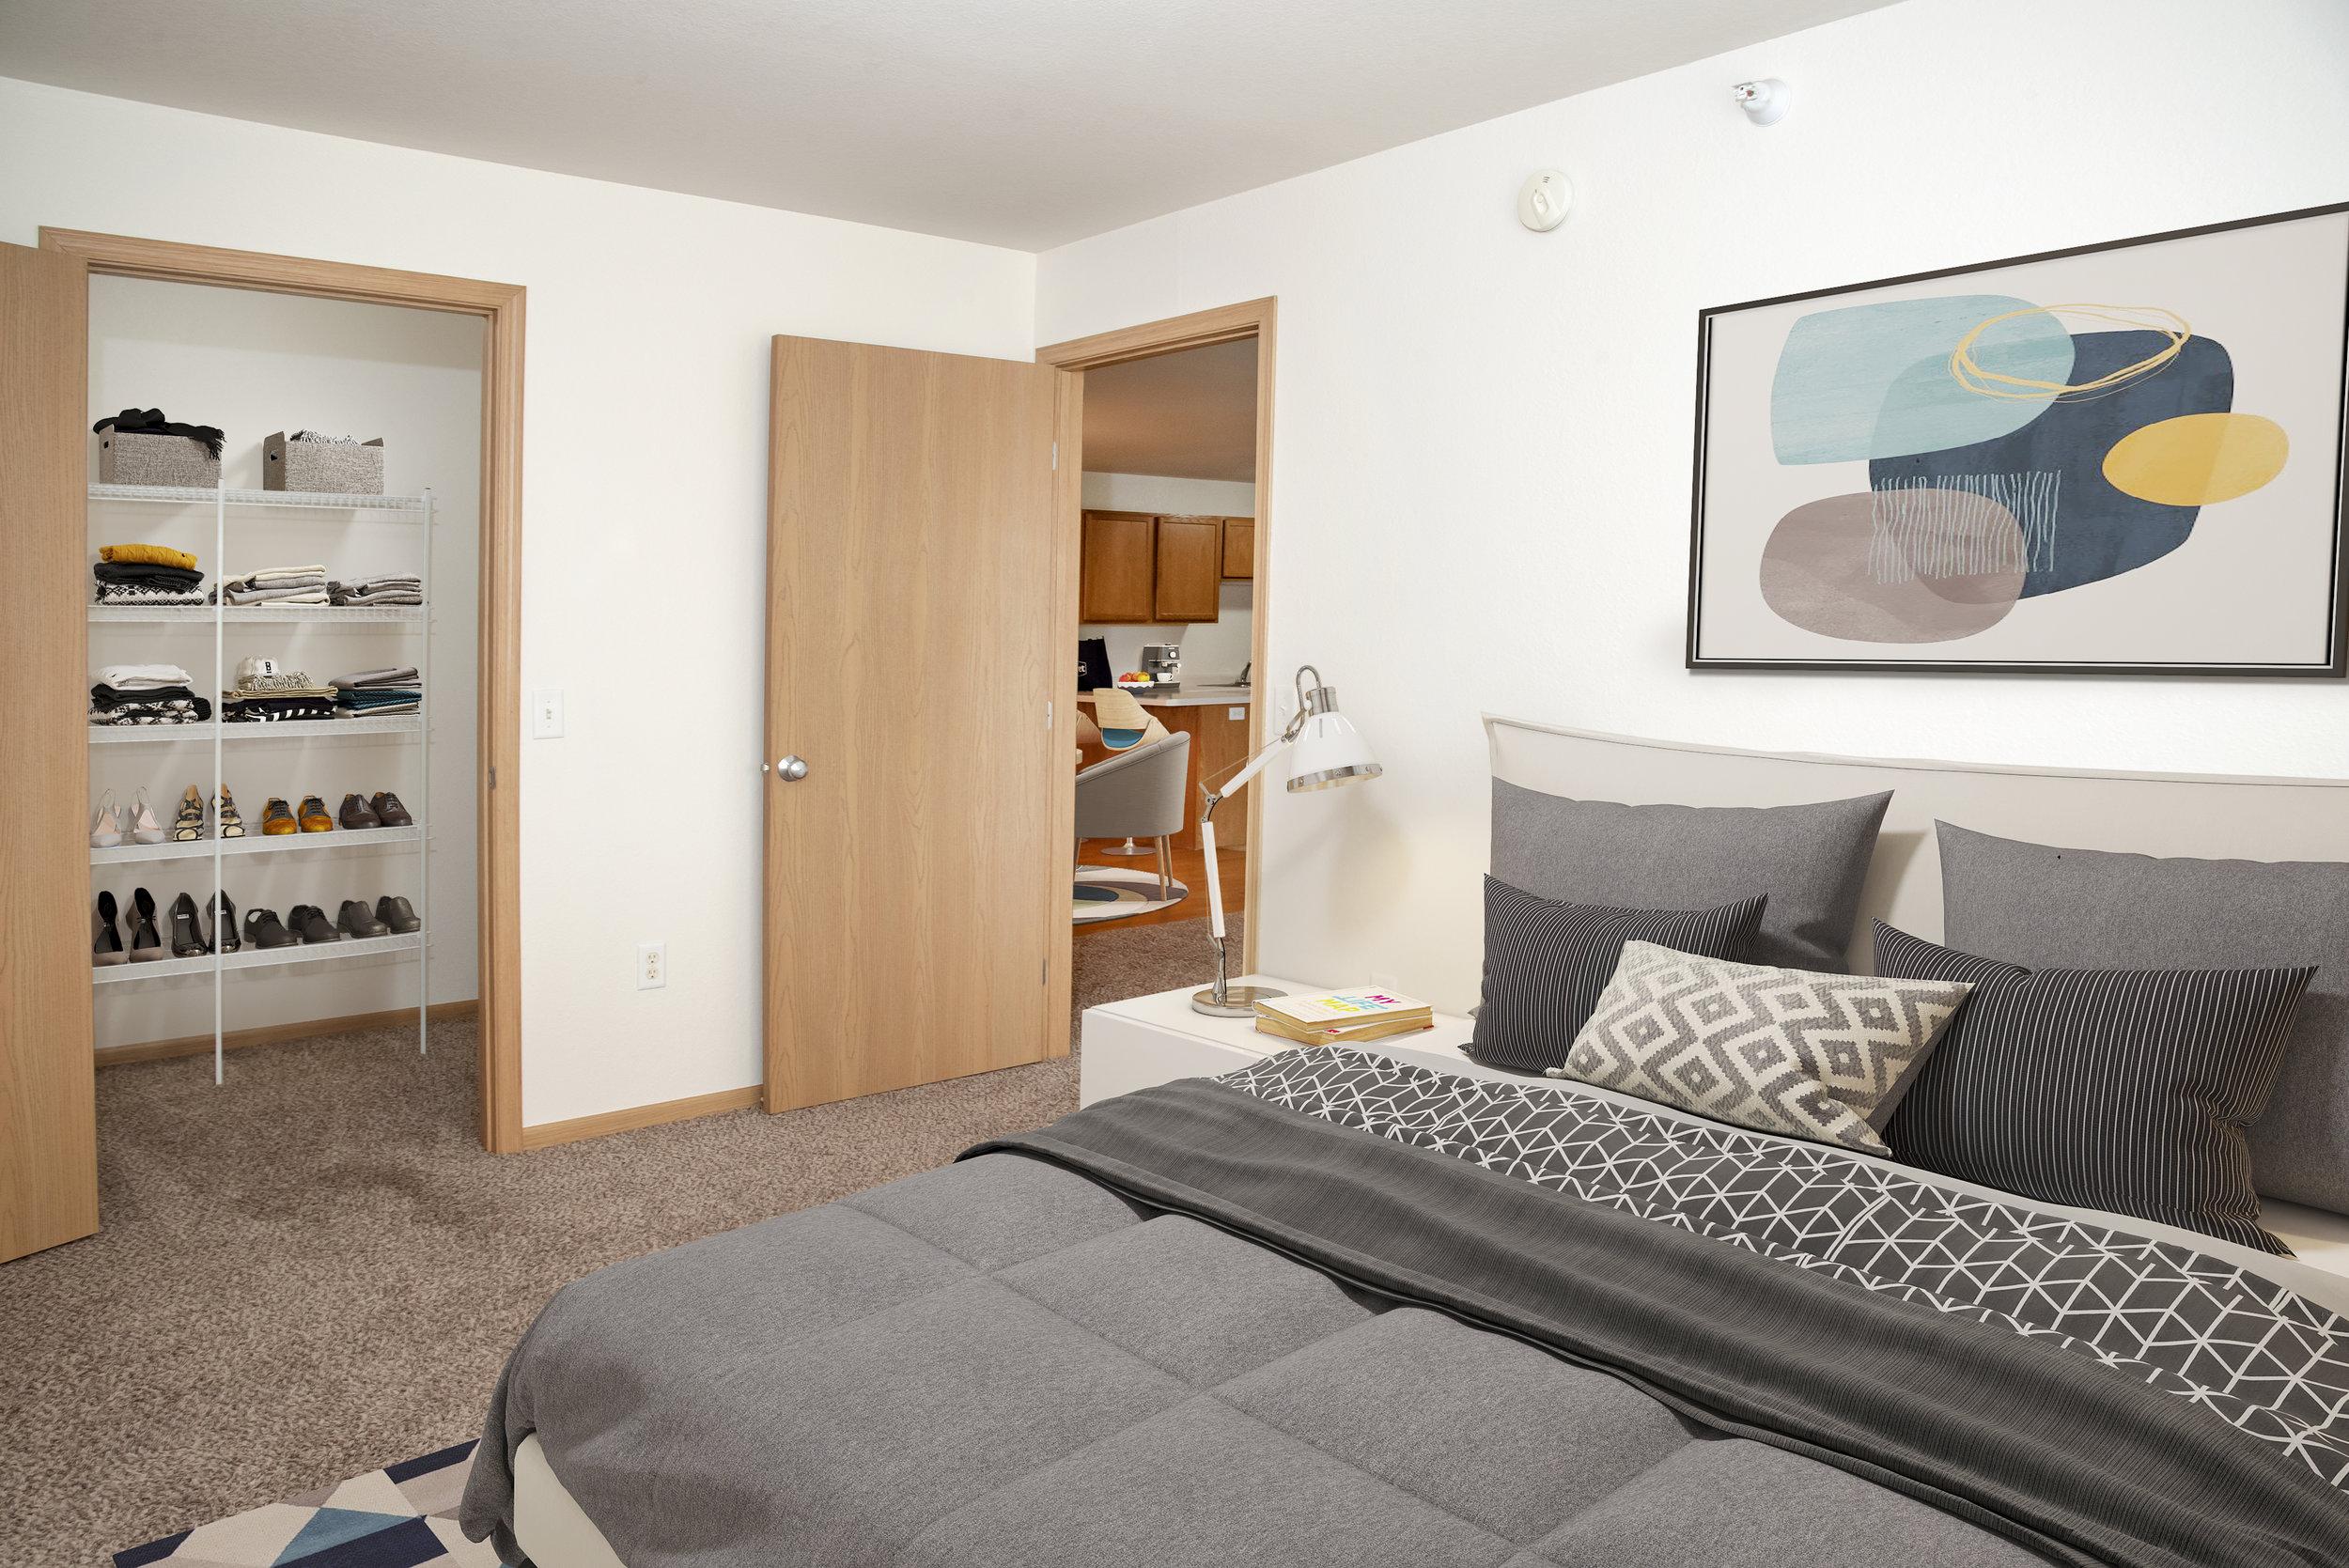 06-Spacious Bedrooms with Plenty of Closet Spaces.jpg